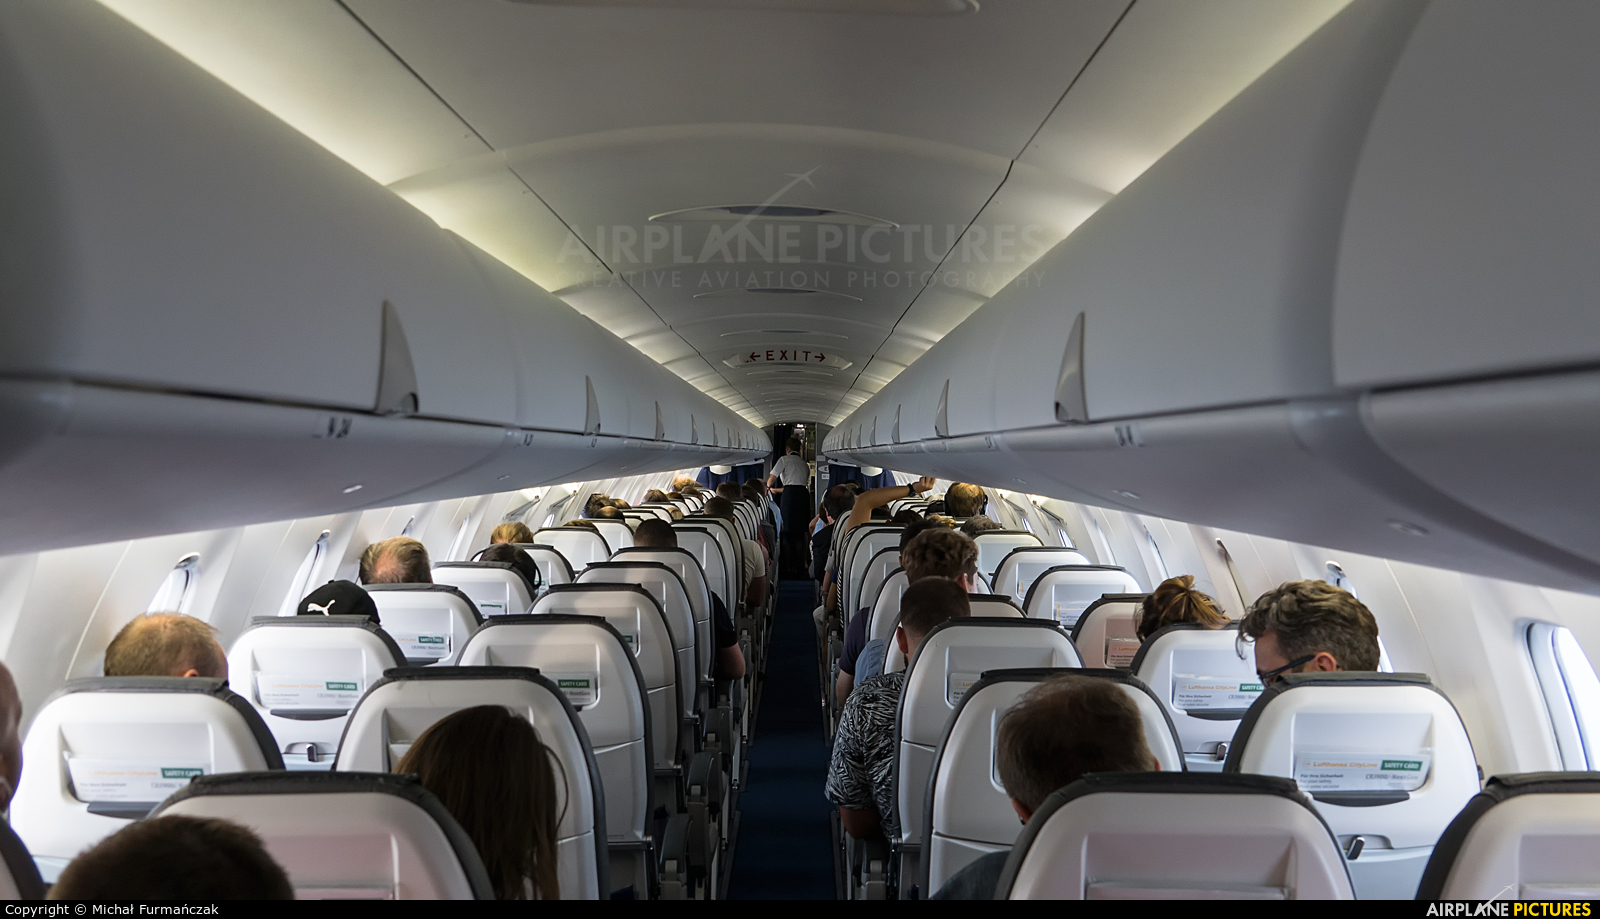 Lufthansa Regional - CityLine D-ACND aircraft at In Flight - International